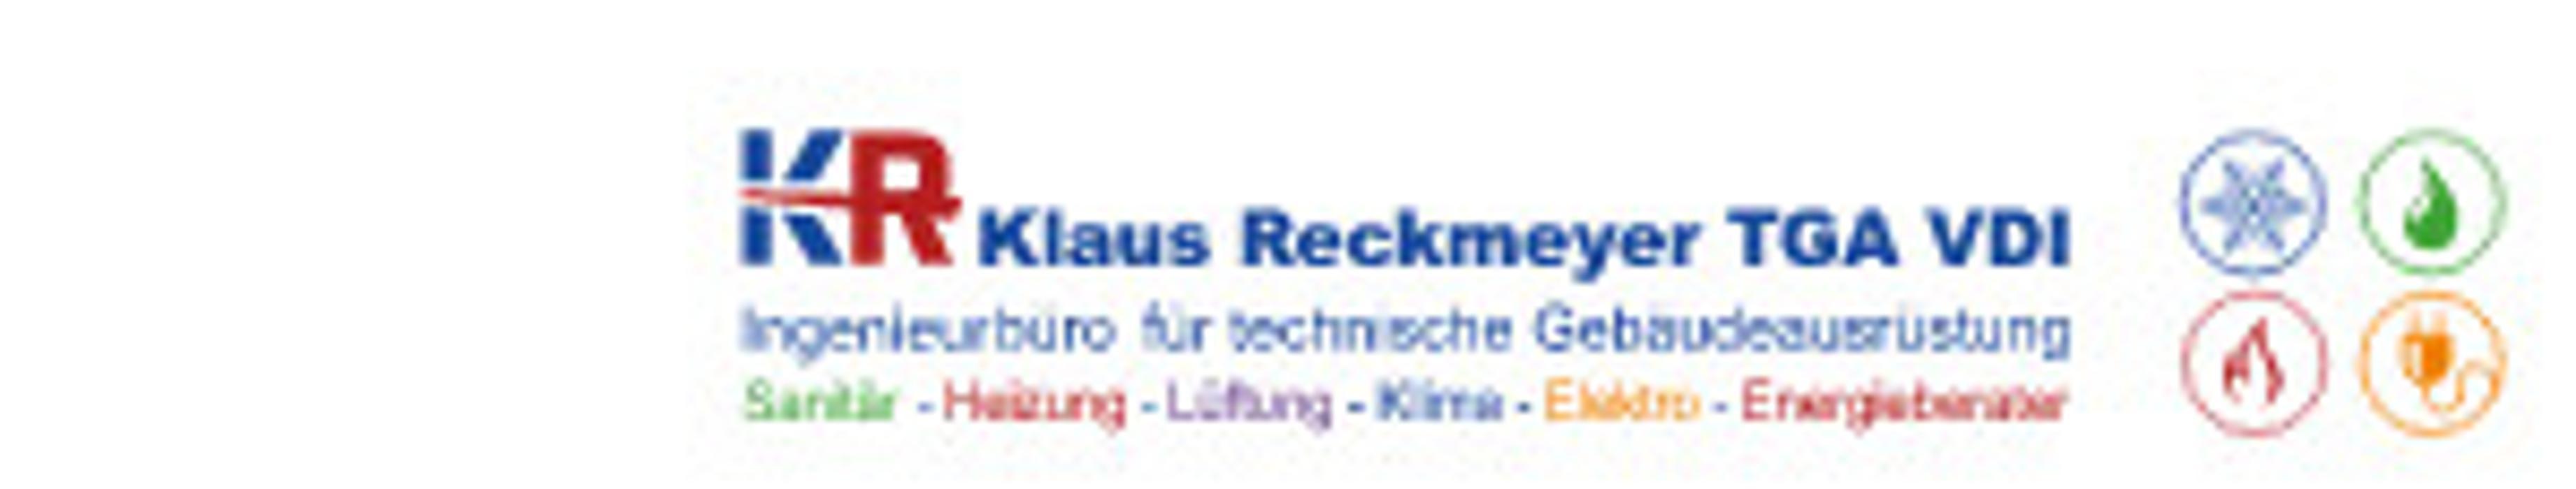 Bild zu KR Klaus Reckmeyer TGA VDI in Gütersloh